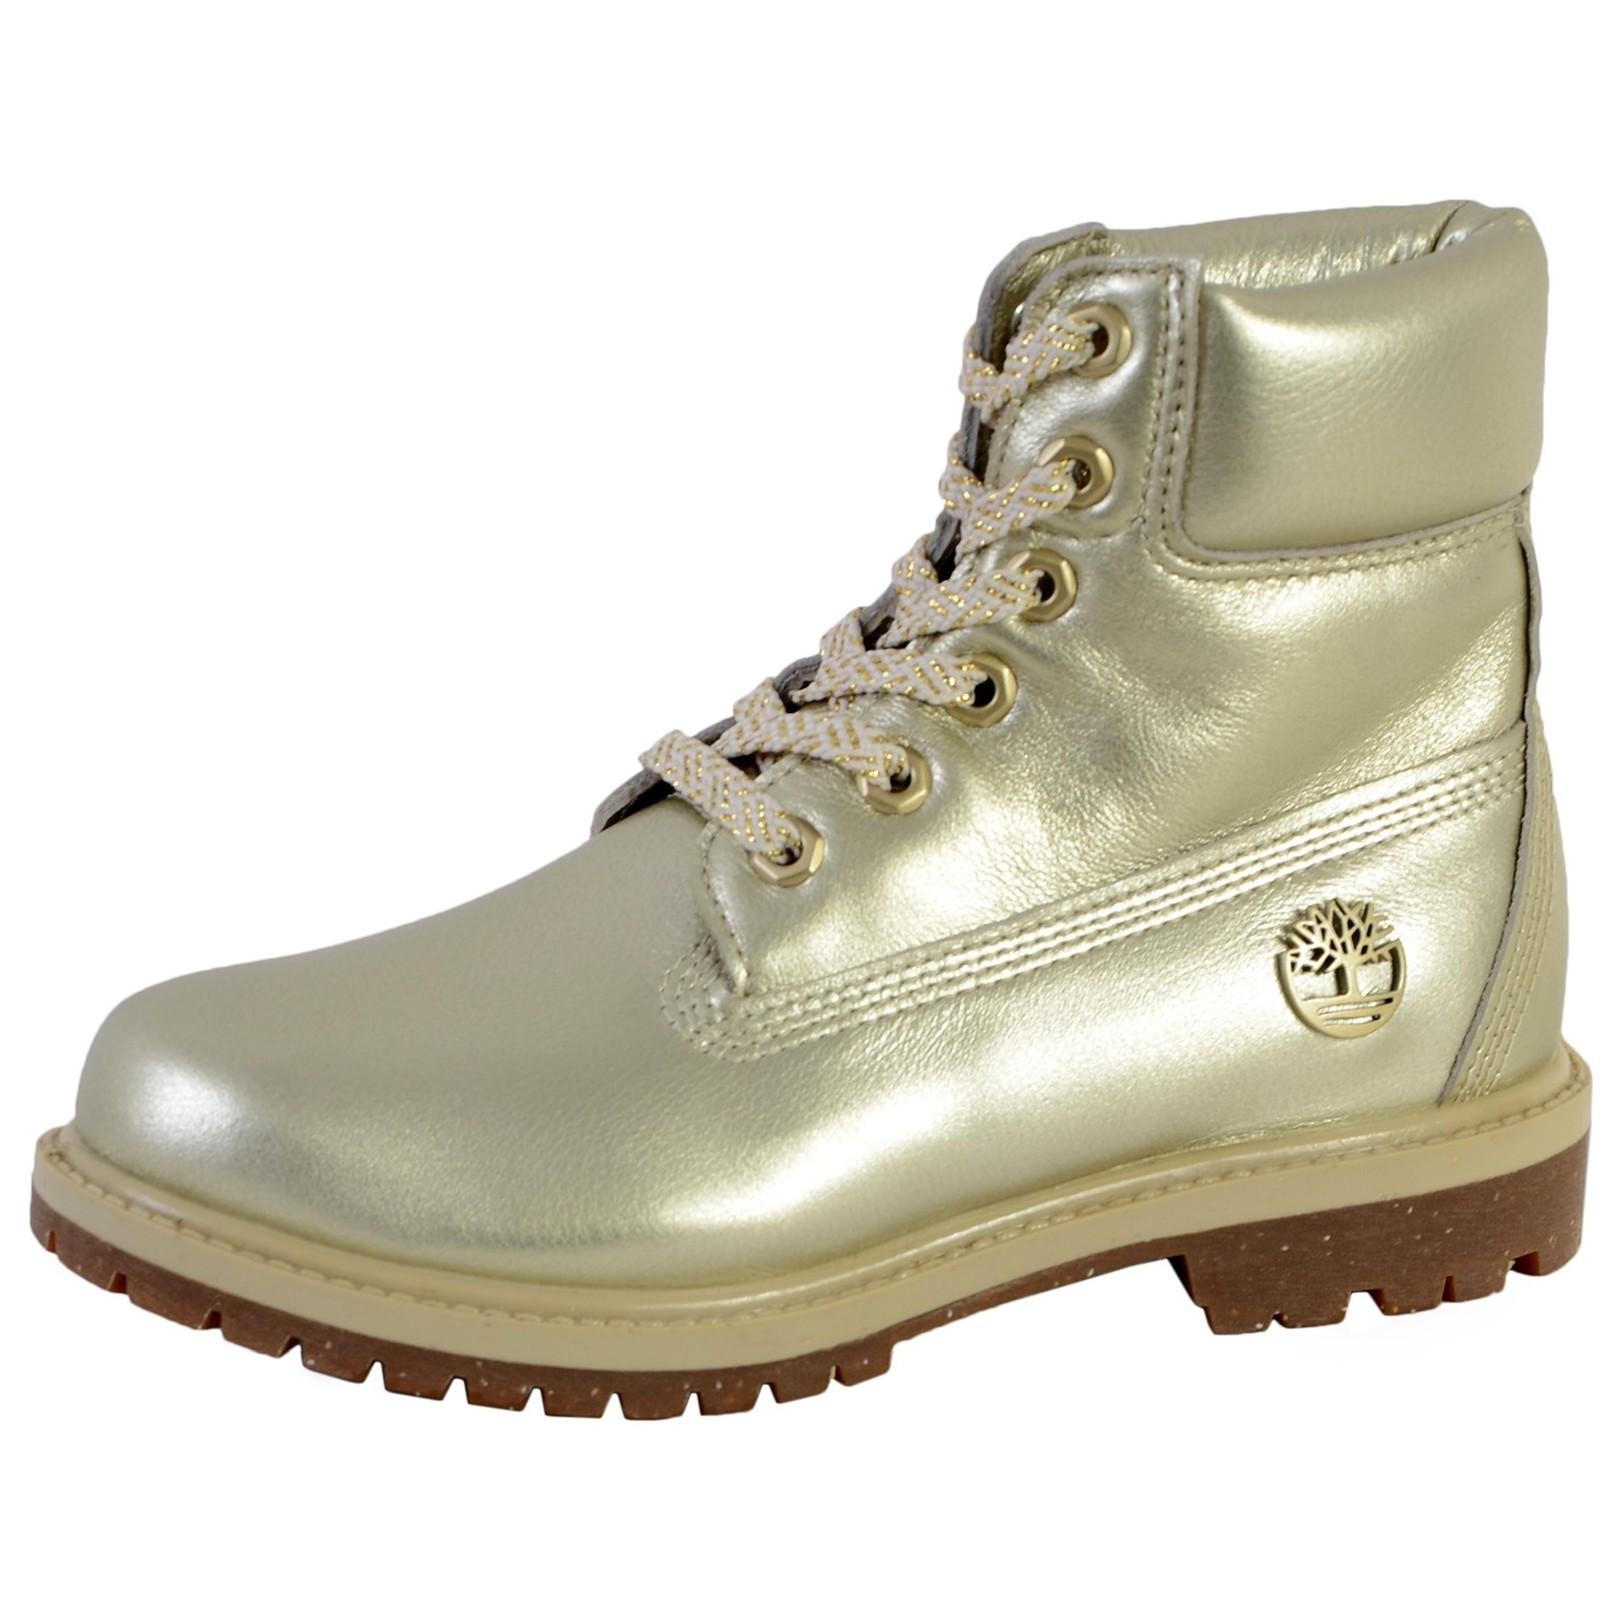 Boot Timberland Premium 6 IN Waterproof